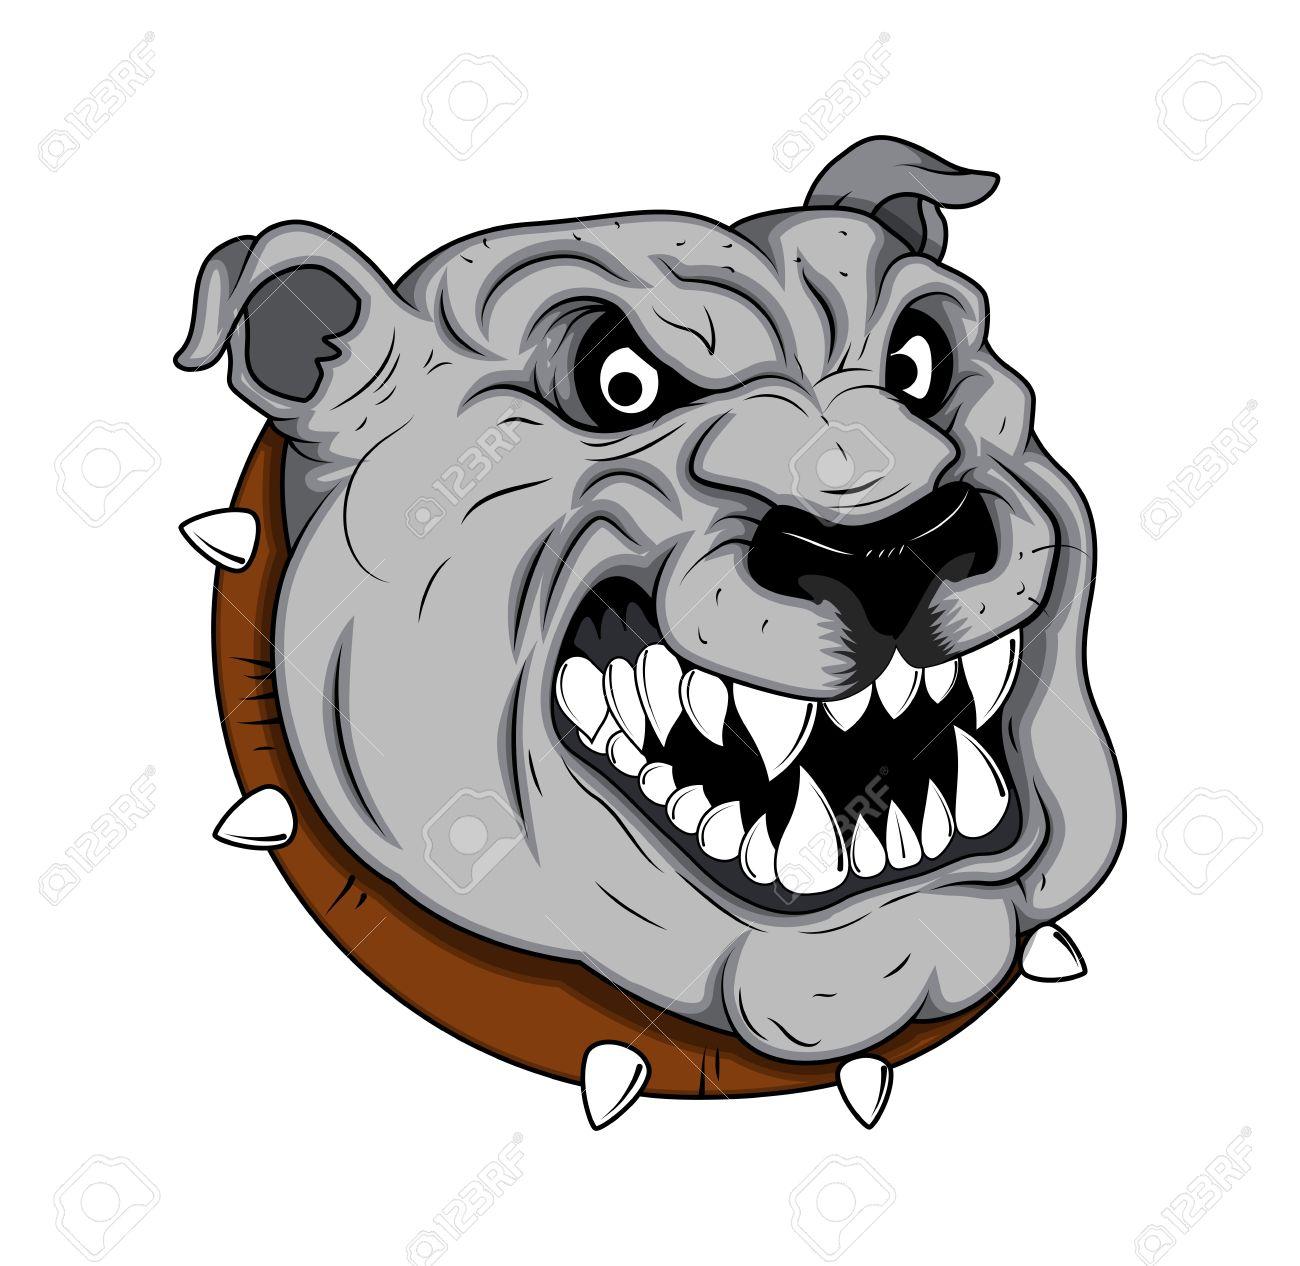 Bulldog Mascot Tattoo Vector Stock Vector - 15759289